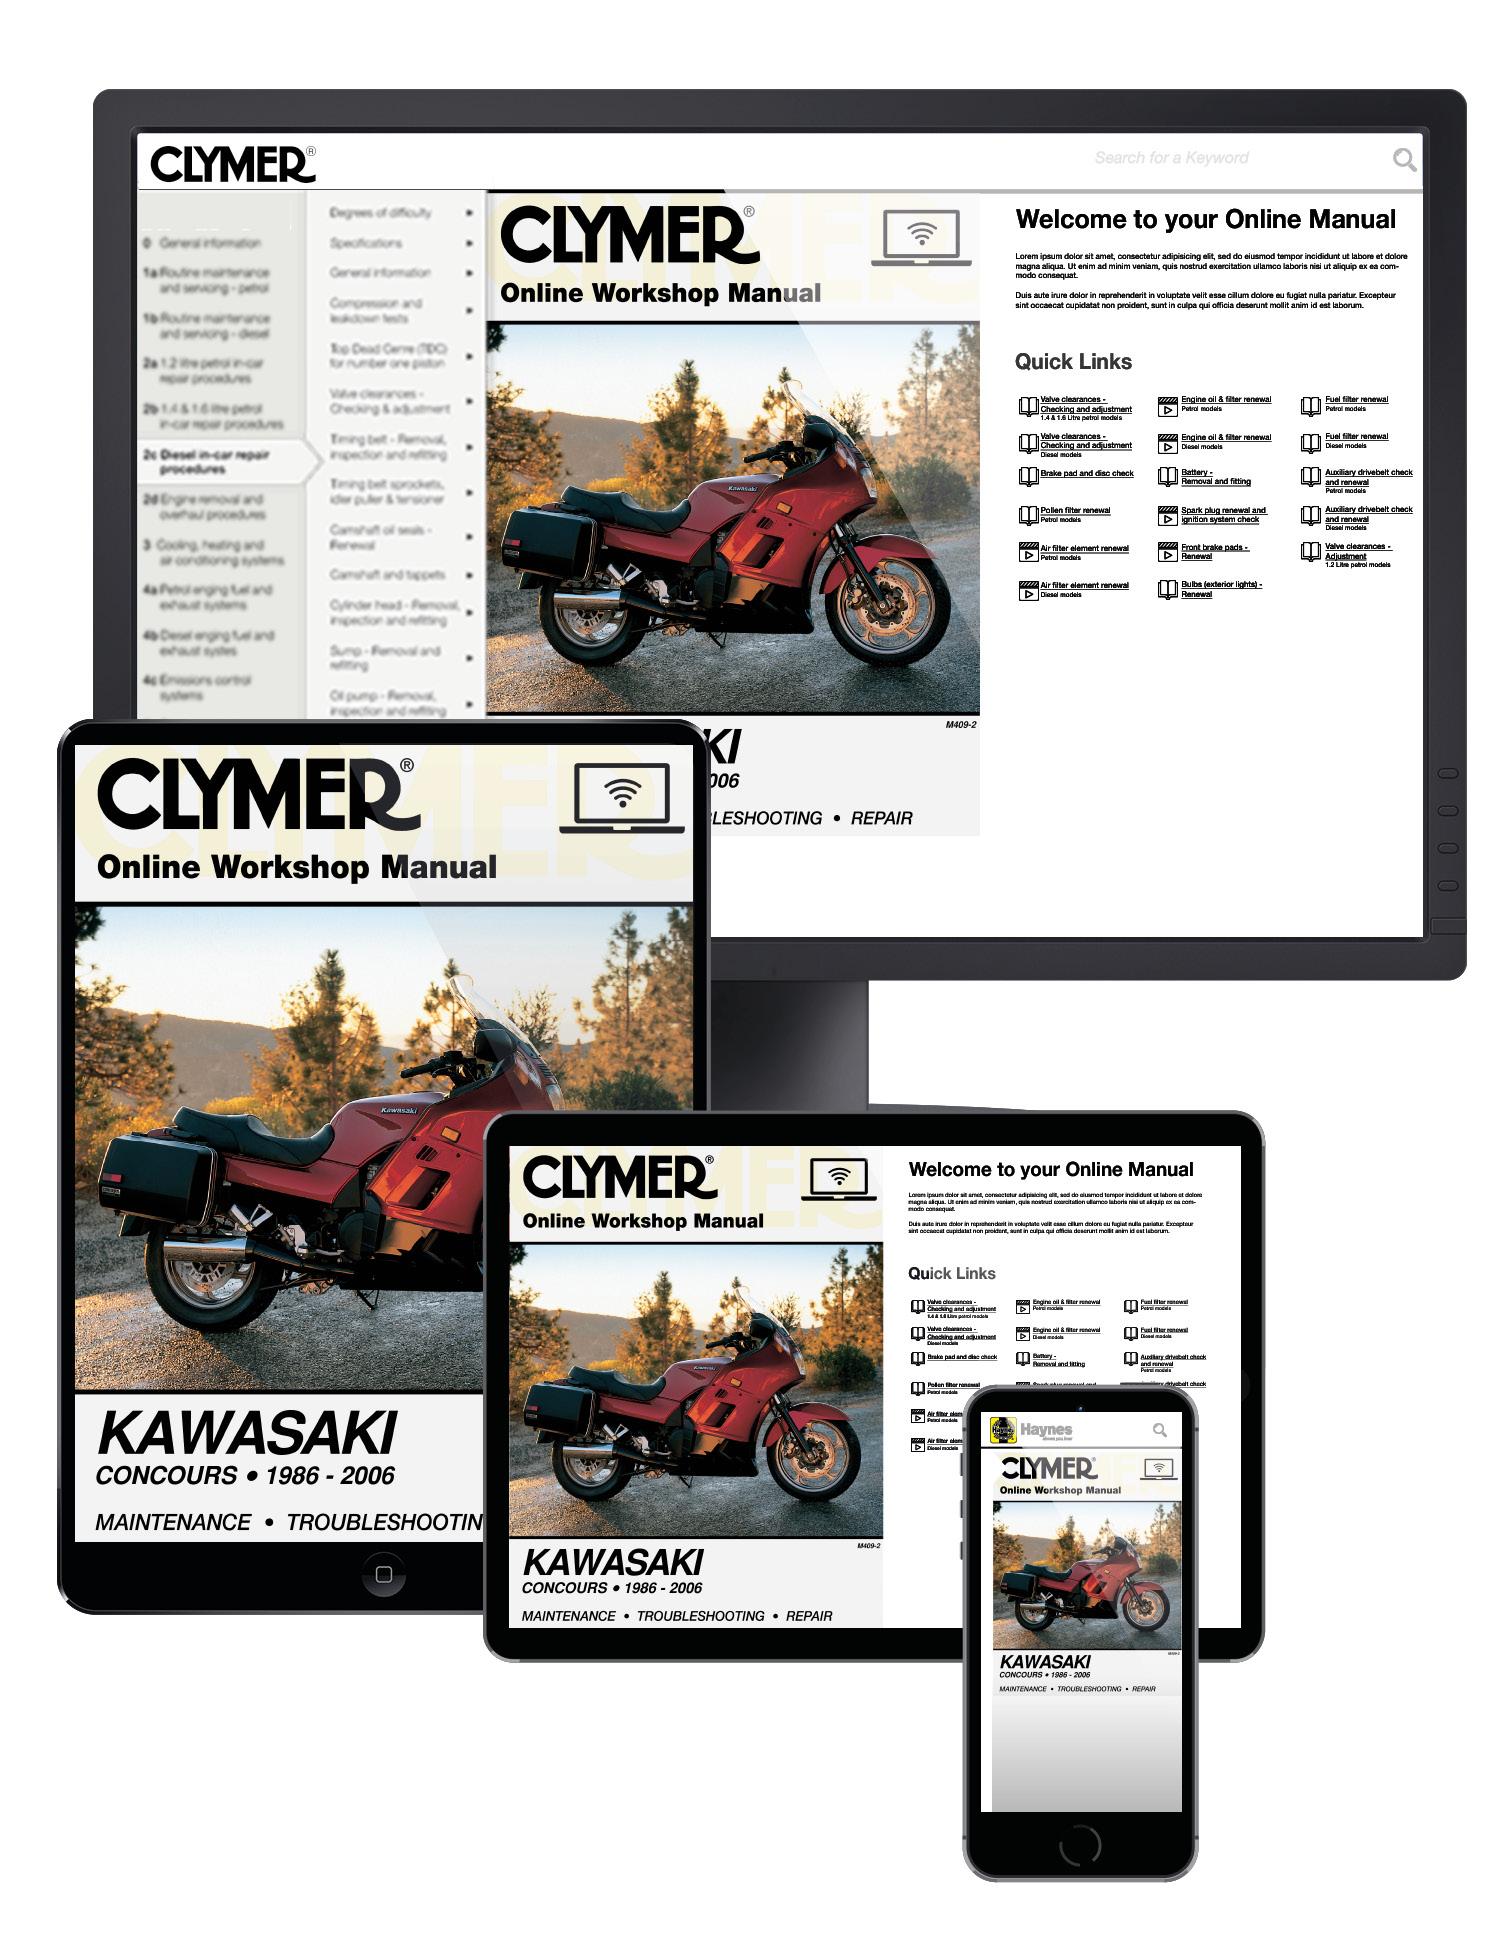 Manual cover for Kawasaki ZG1000 Concours Motorcycle (1986-2006) Service Repair Manual Online Manual